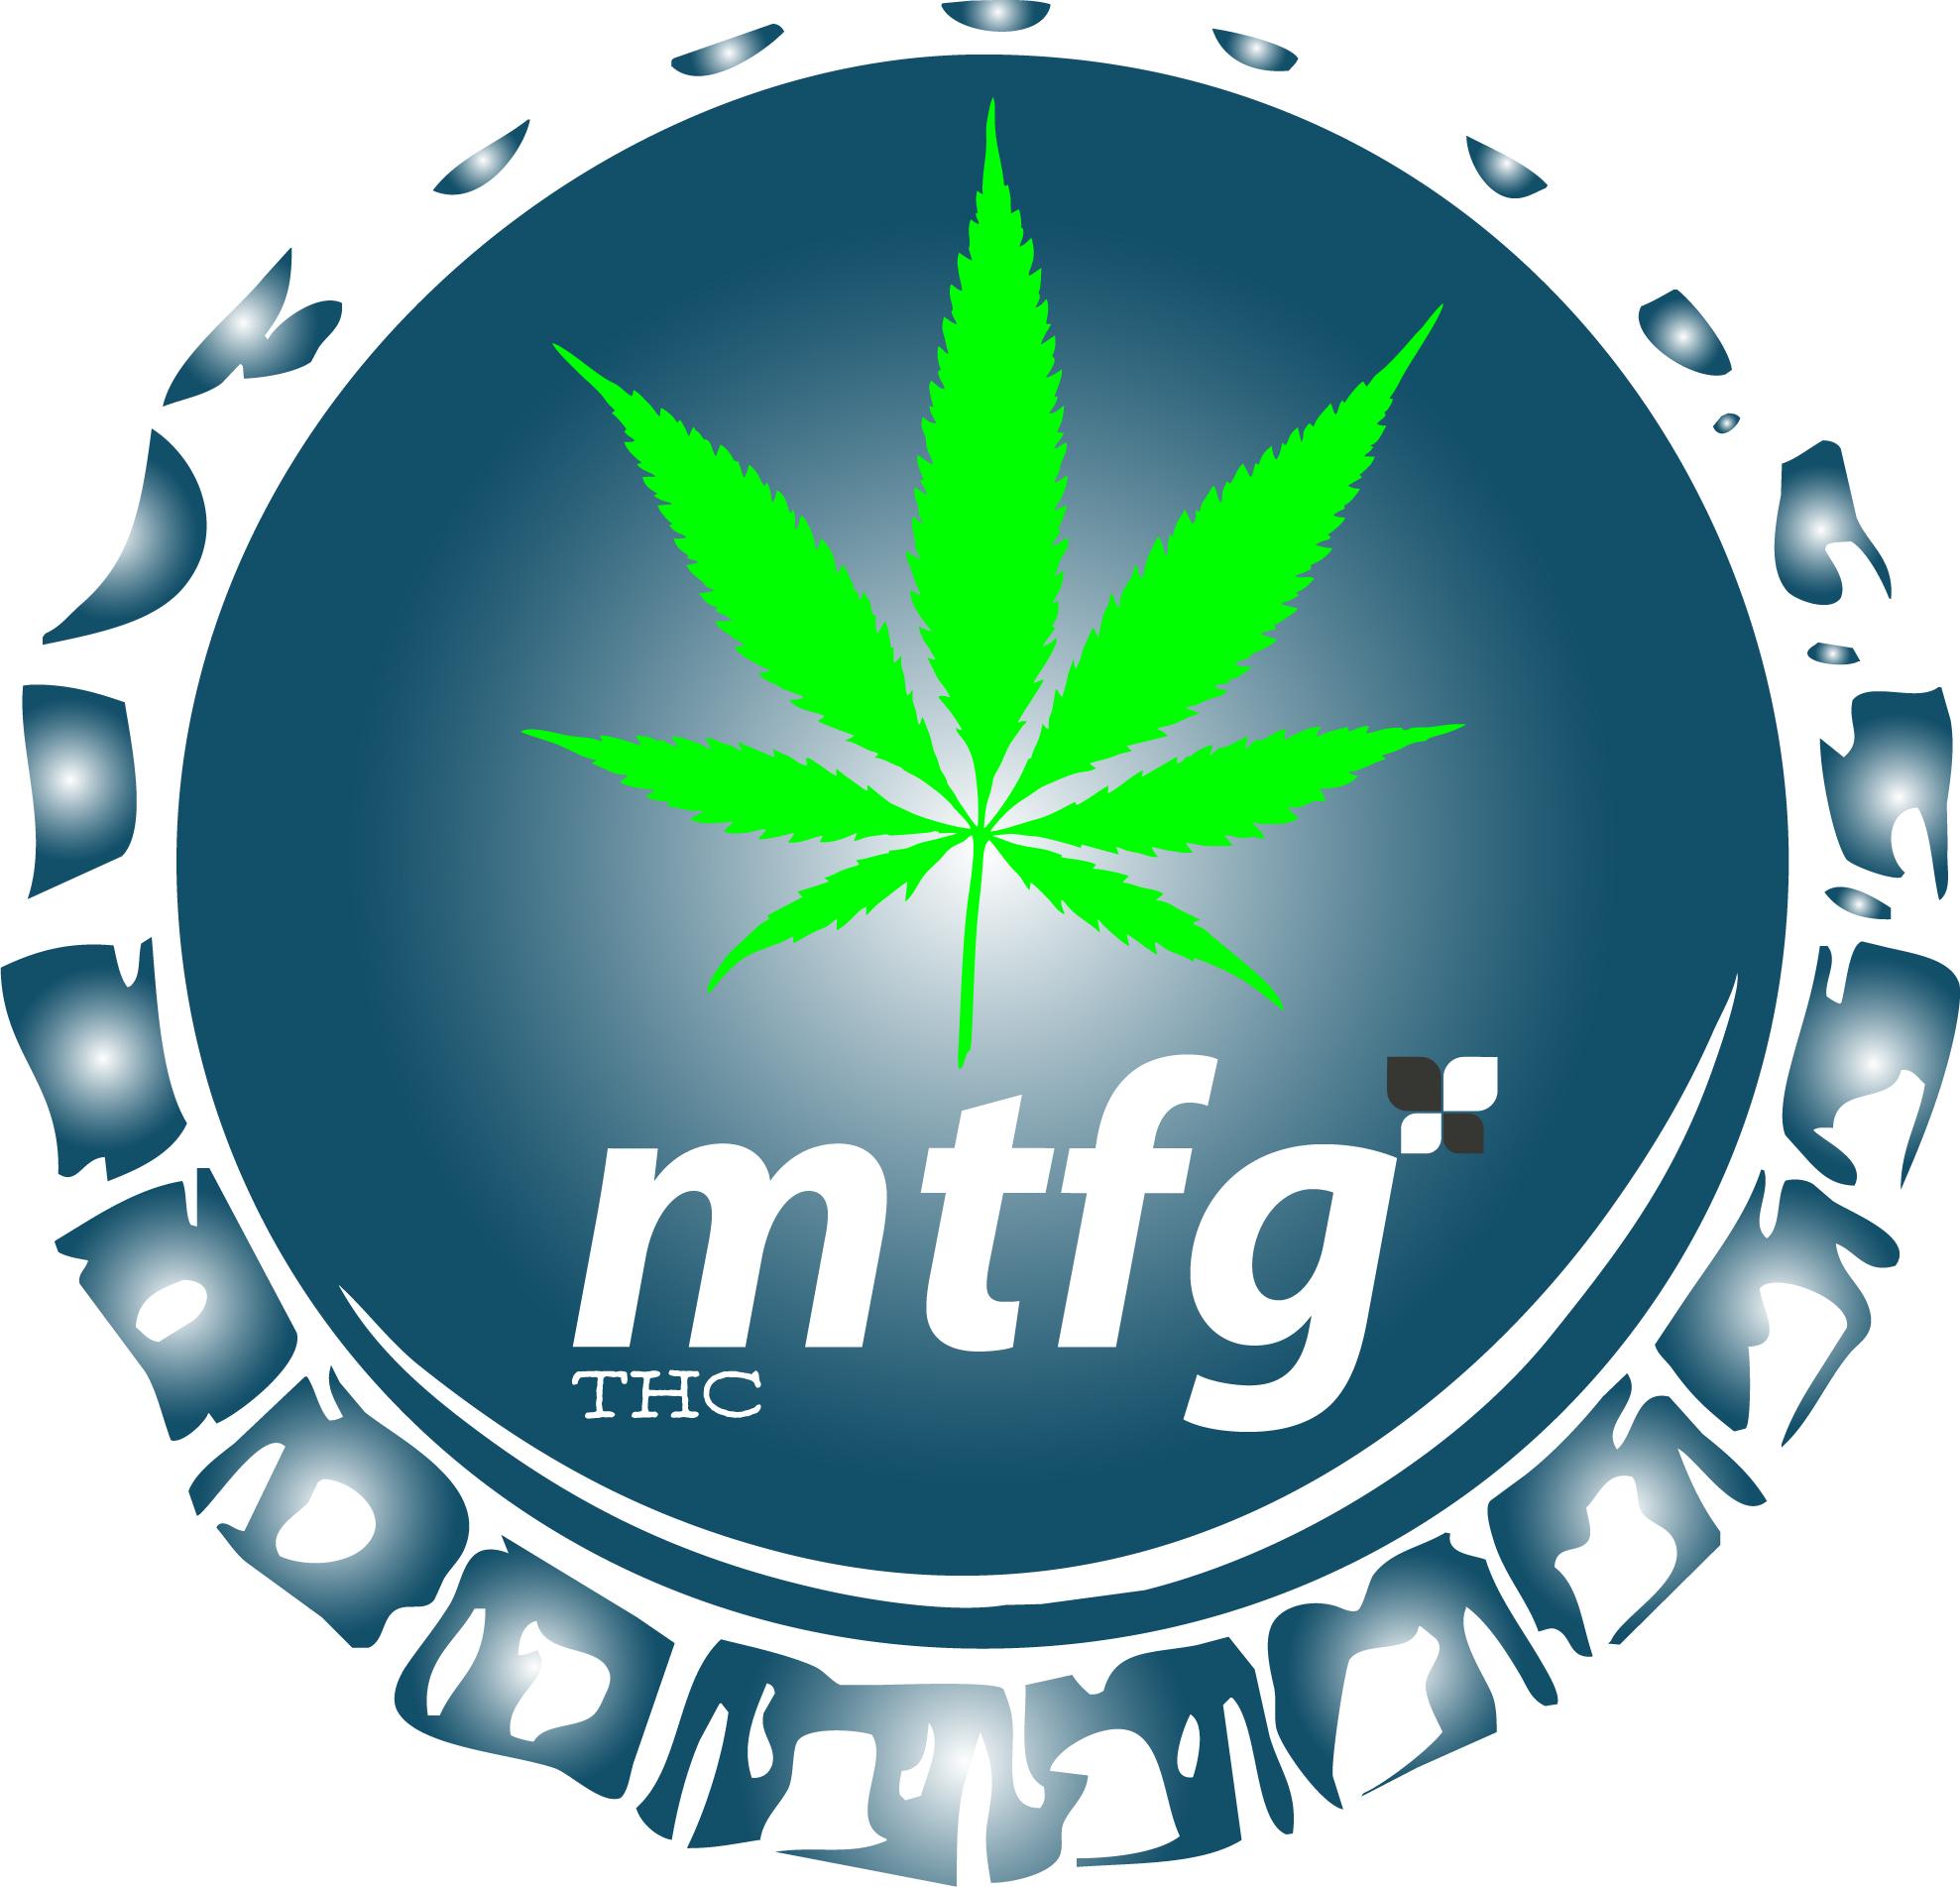 MTFG THC